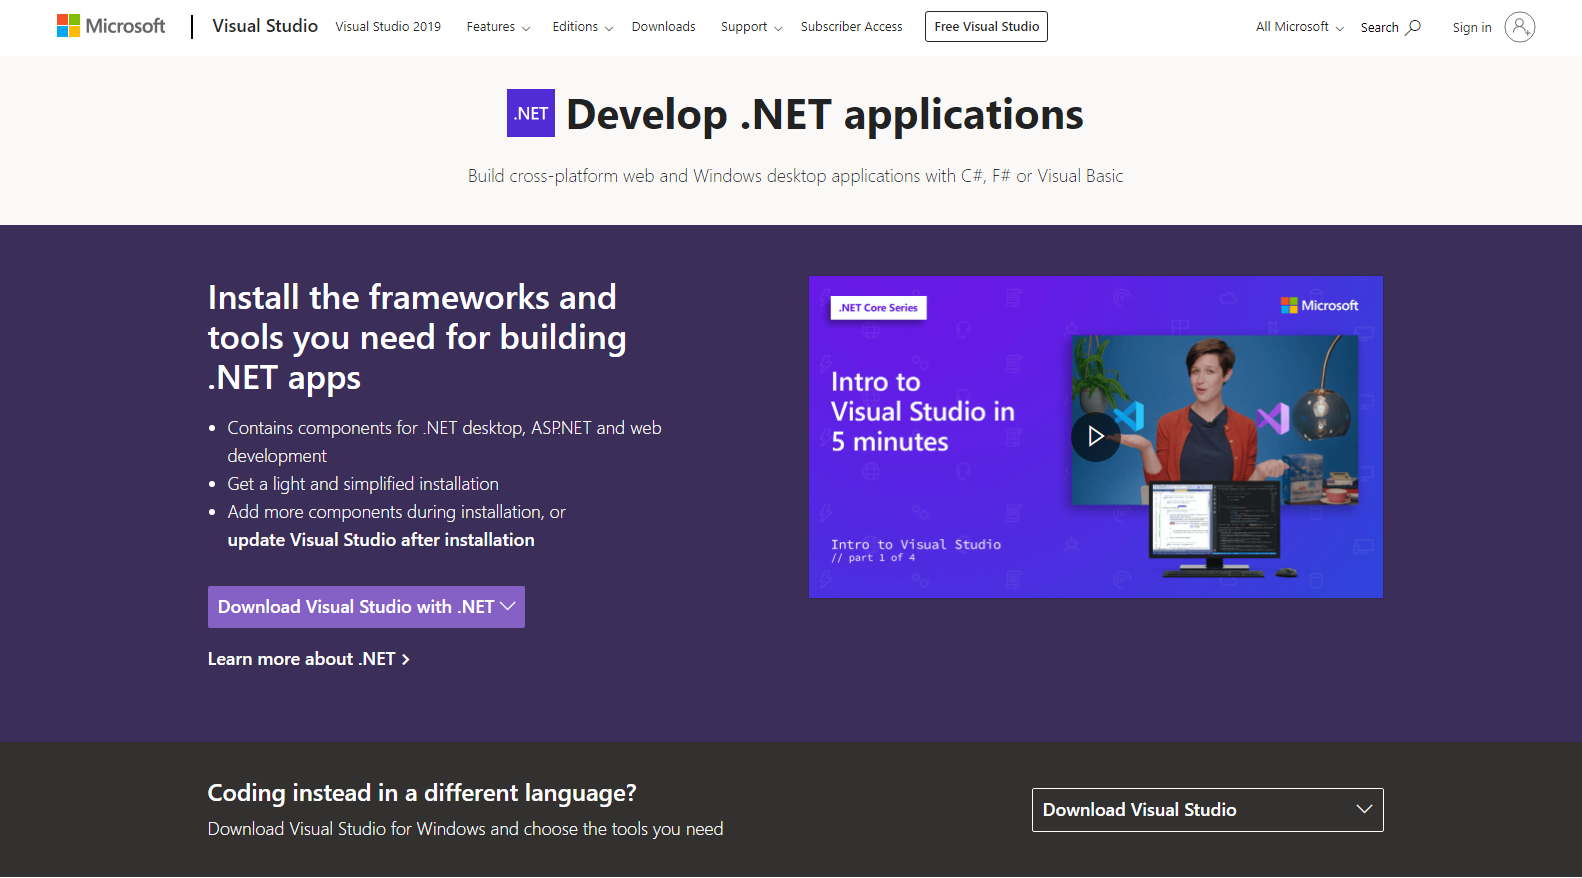 What is Microsoft Visual Studio?